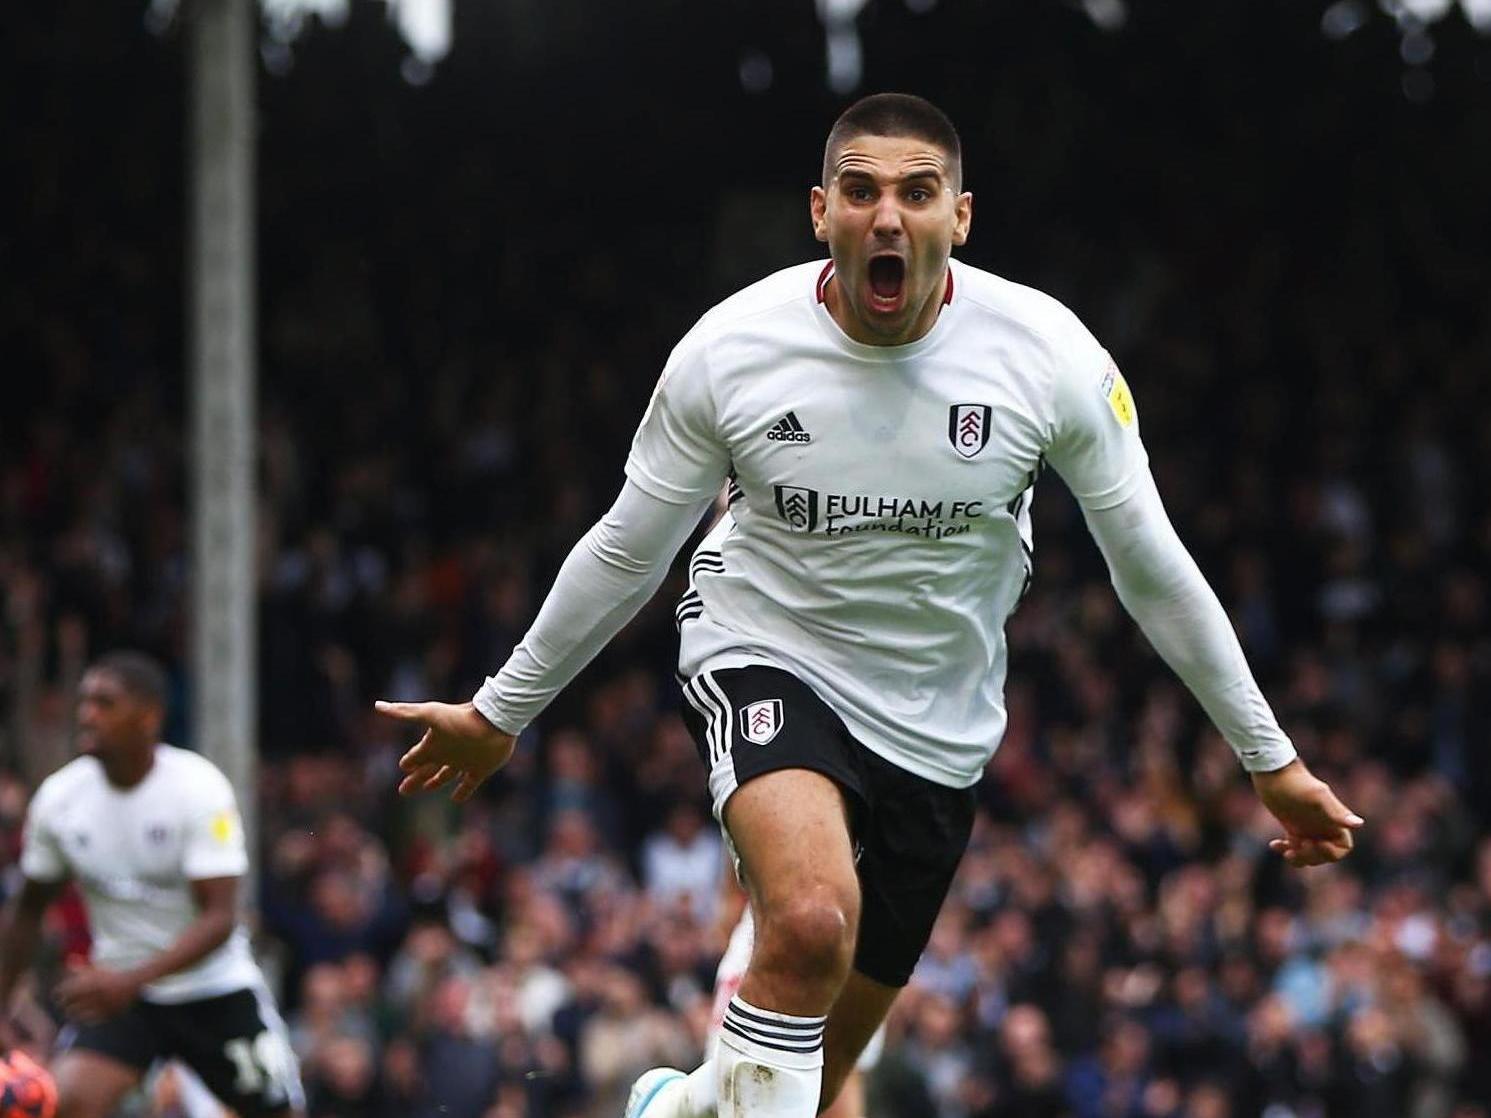 Aleksandar Mitrovic returns in time for Fulham's Championship play-off final against Brentford